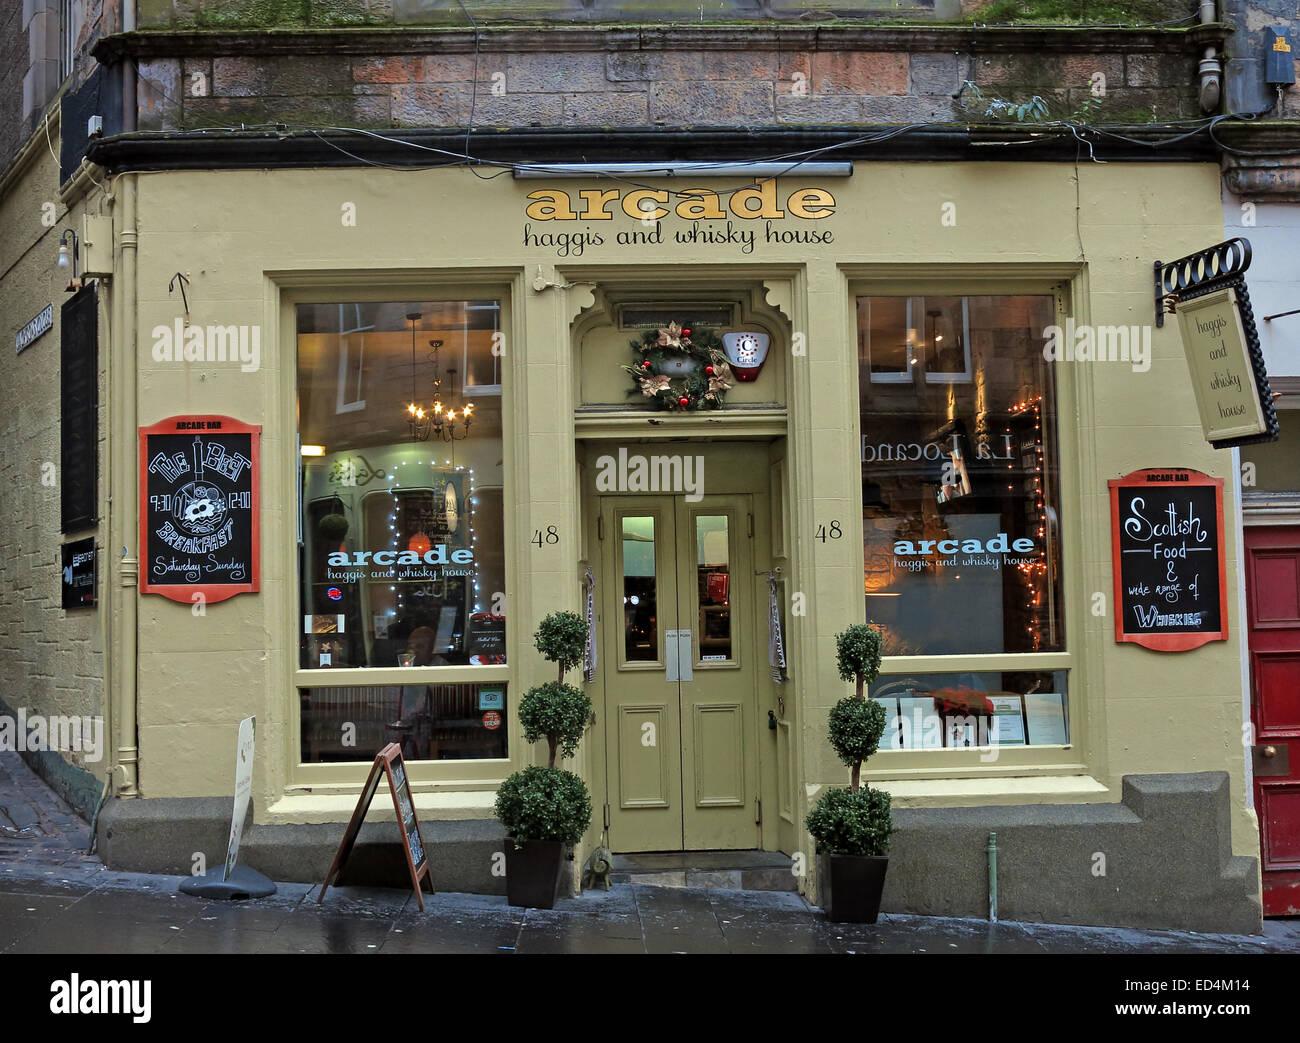 pub,bar,tourist,tourism,cask,ales,selection,of,malt,Scotch,United Kingdom,Whisky House,malts,drink,drinks,drinkers,Gotonysmith